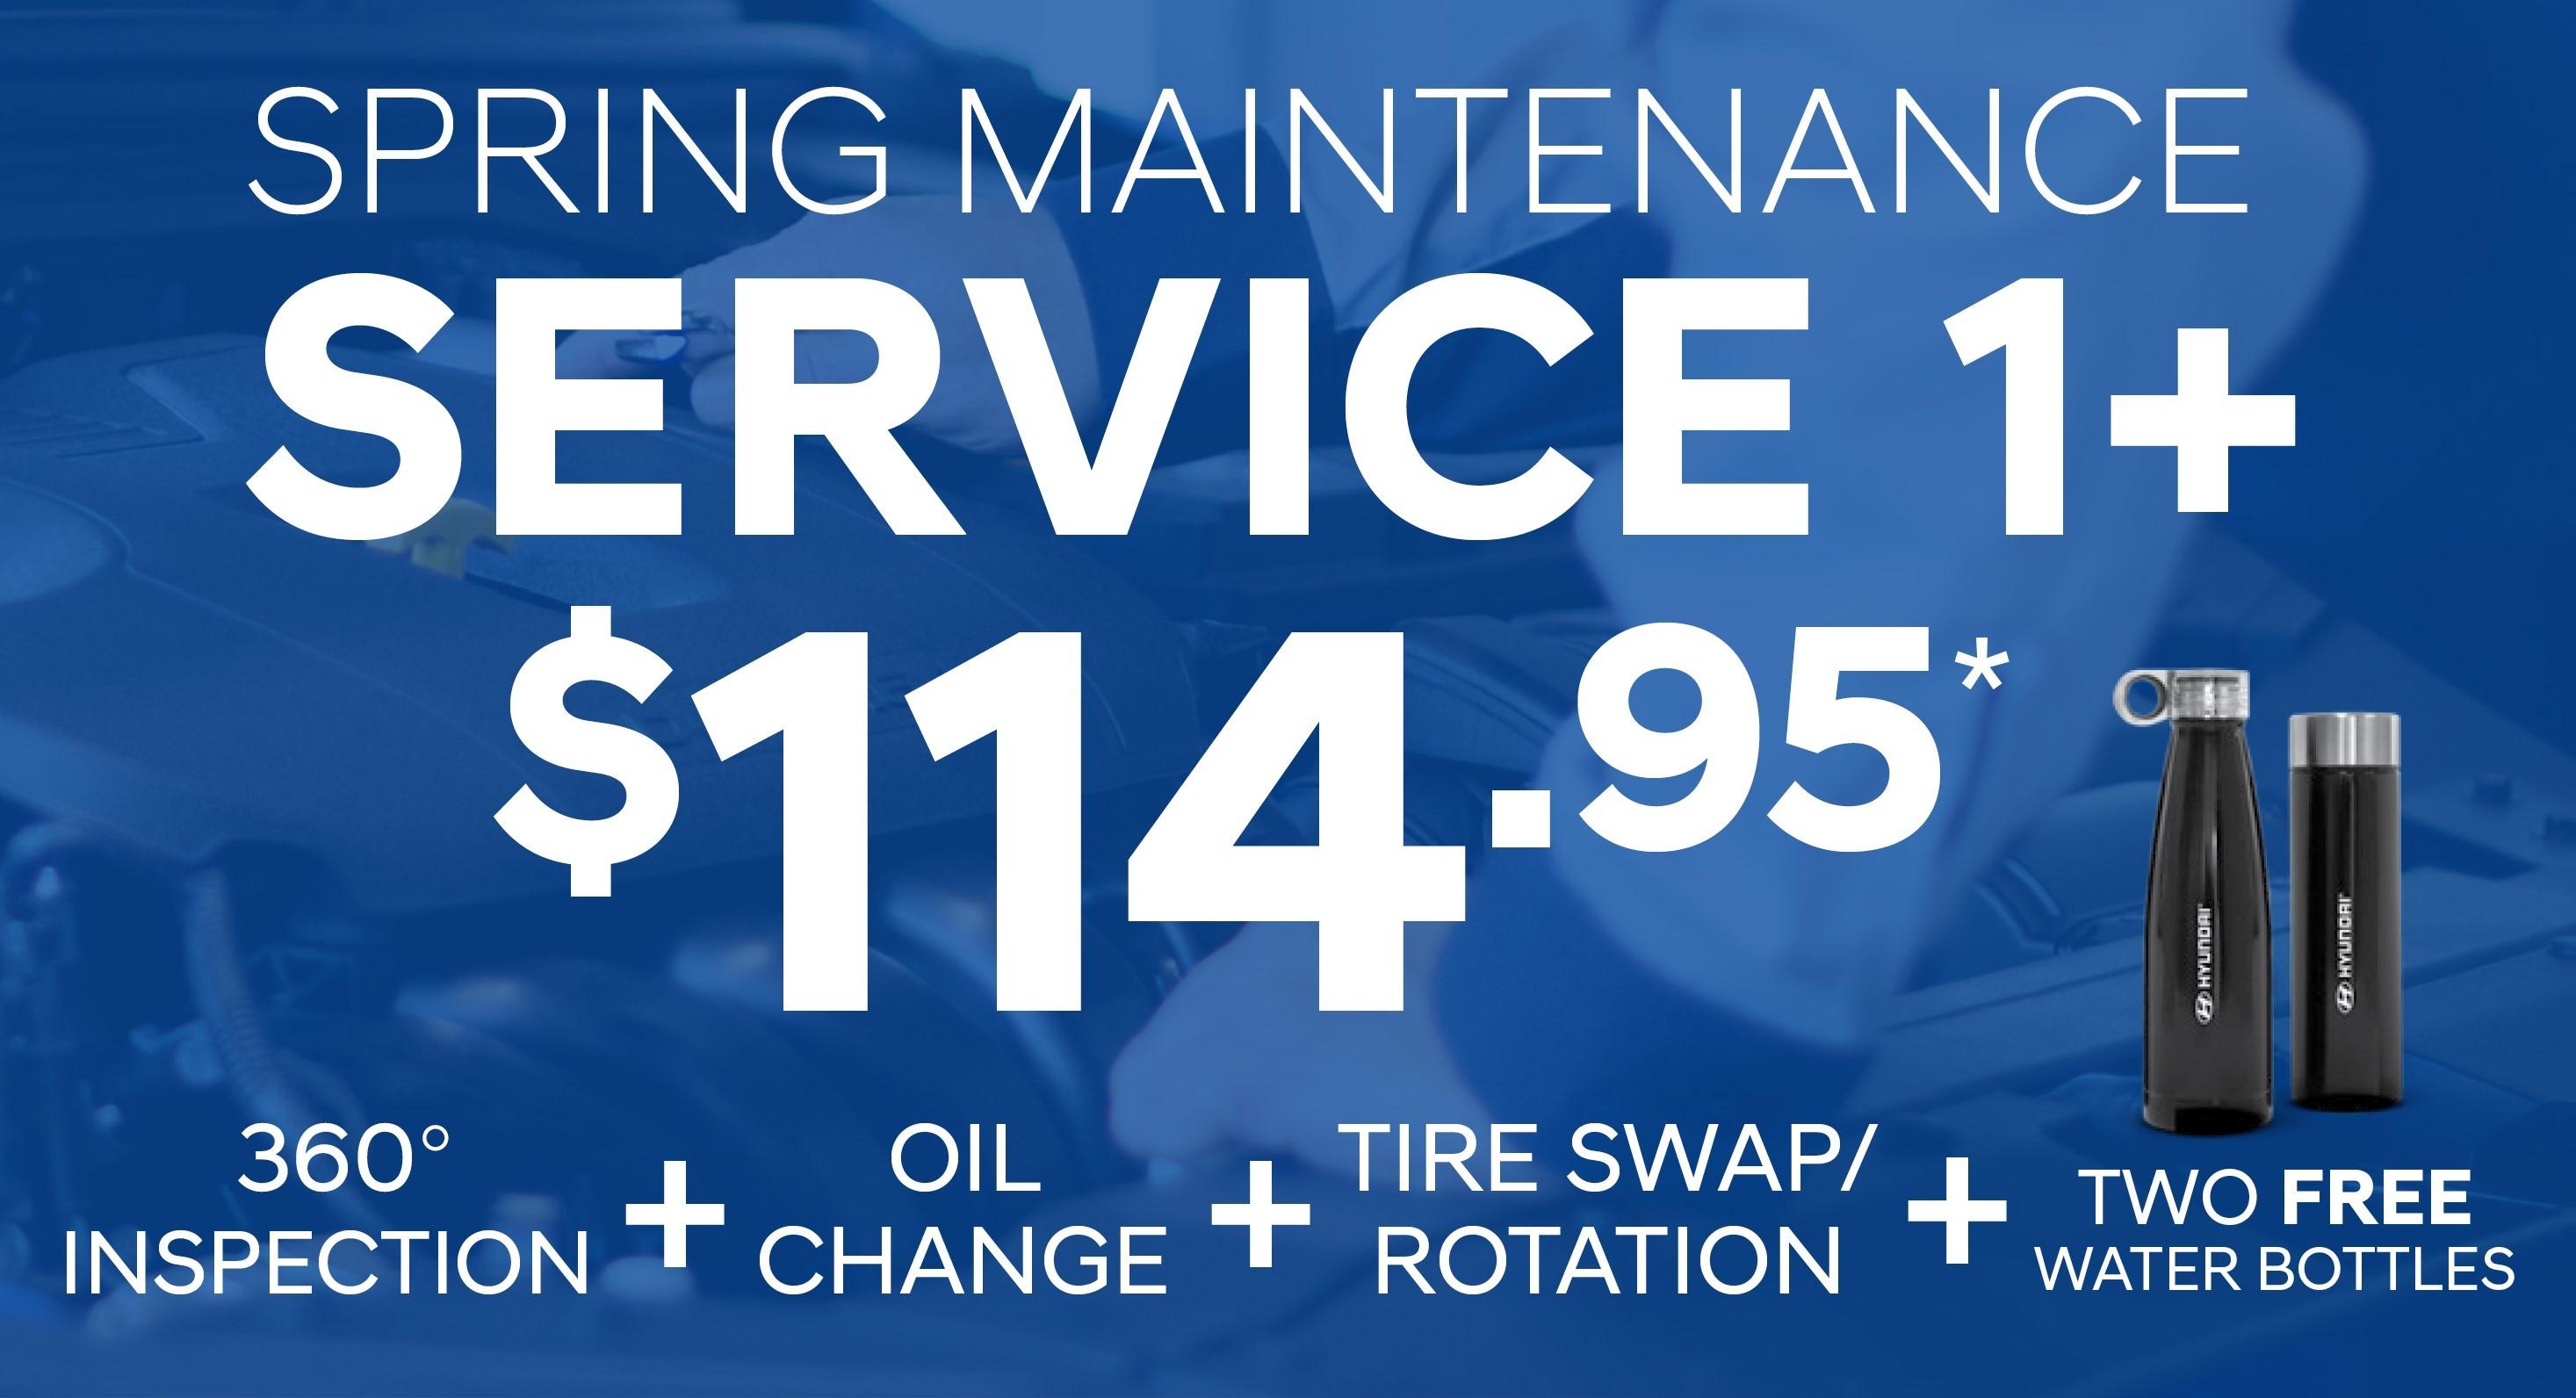 Spring Maintenance Service